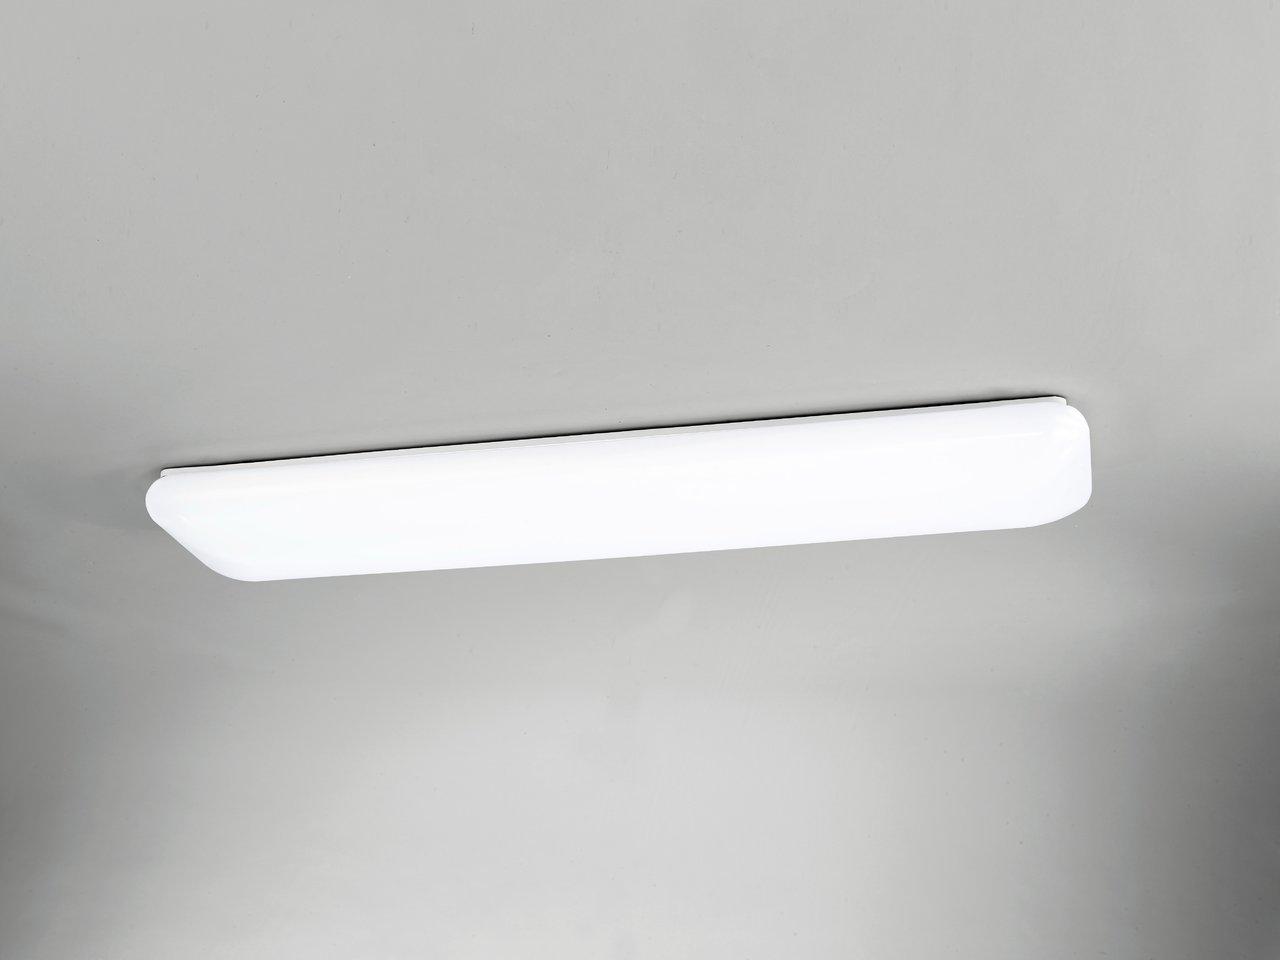 mantra rectangle plafonnier led rectangulaire 3800 lm. Black Bedroom Furniture Sets. Home Design Ideas